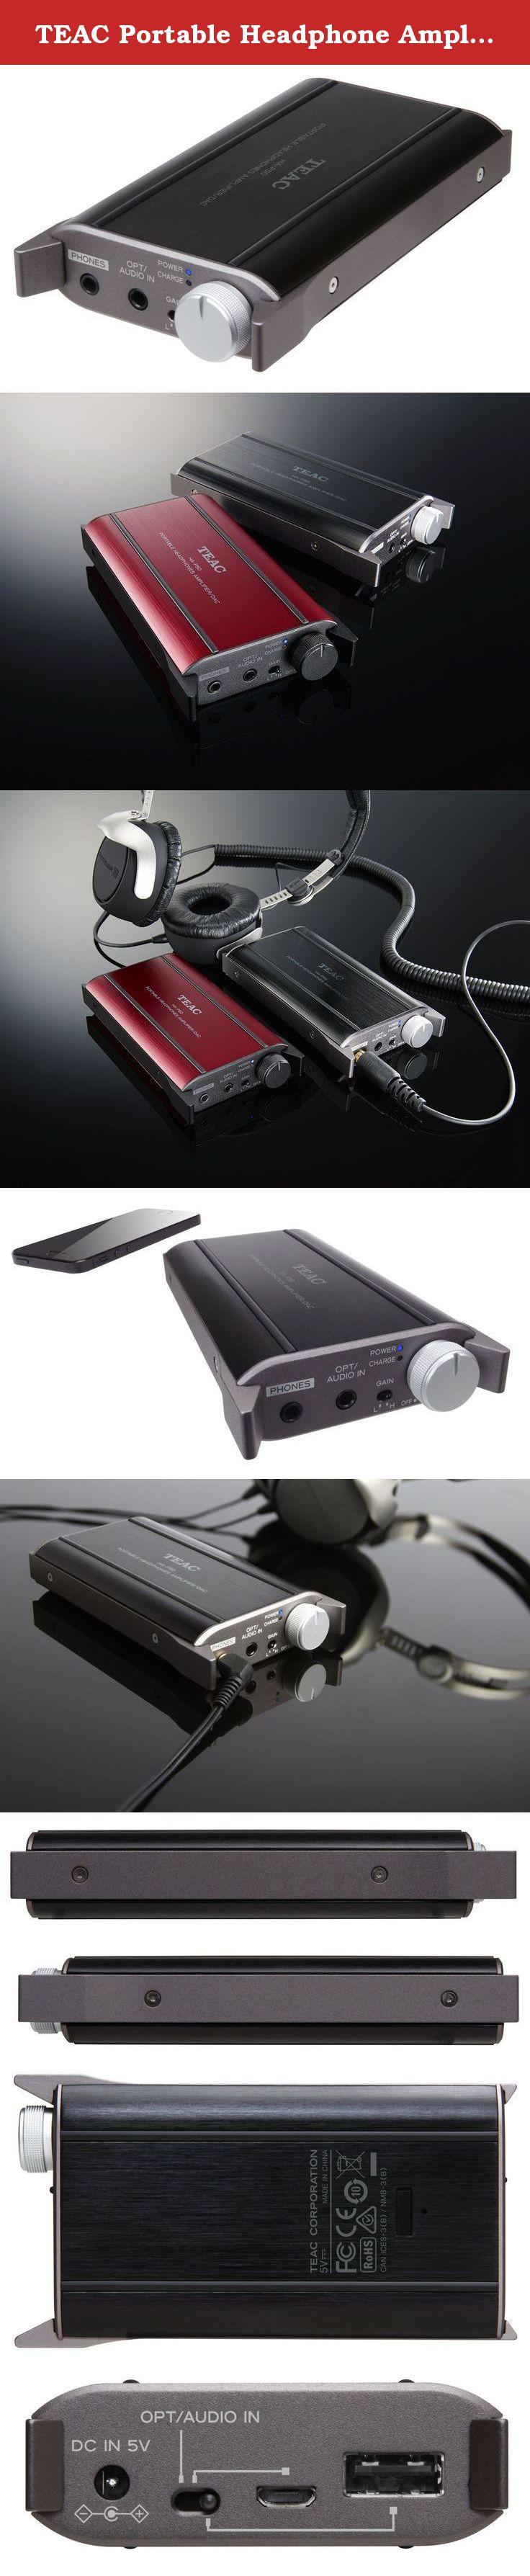 98afd92464d TEAC Portable Headphone Amplifier HA-P50. High quality, portable headphone  amplifier with built